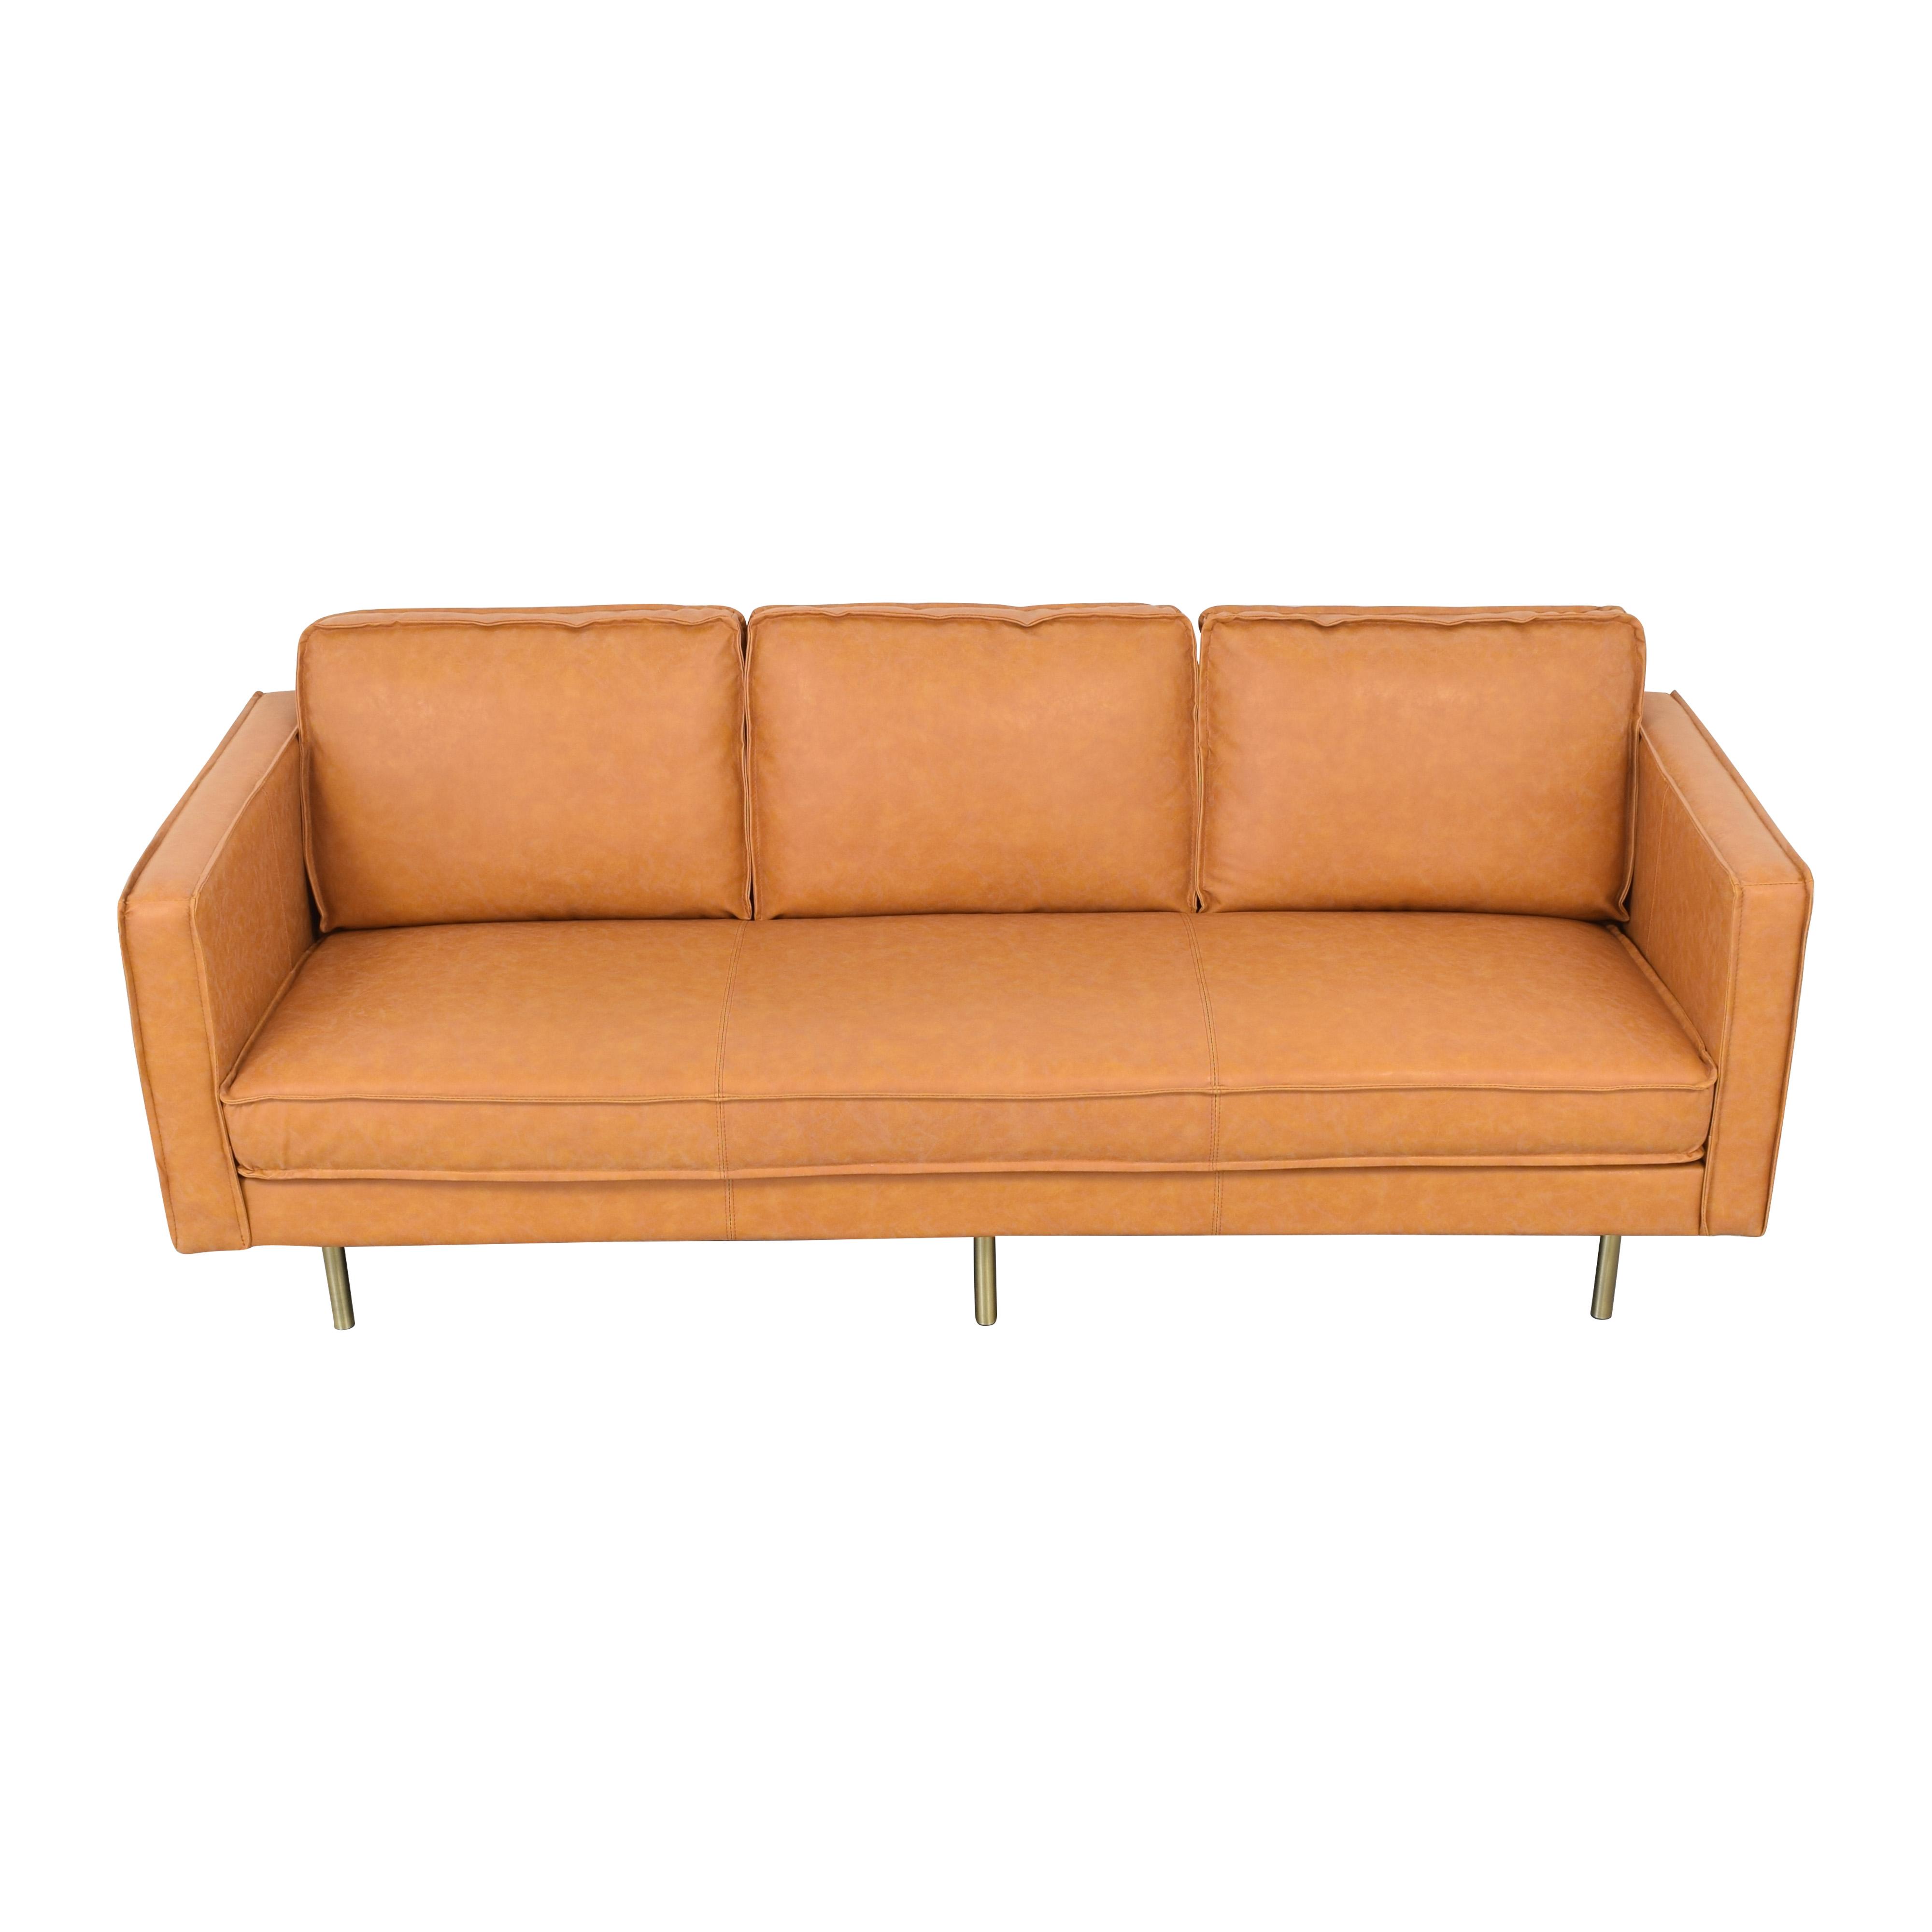 AllModern AllModern Donny Sofa used